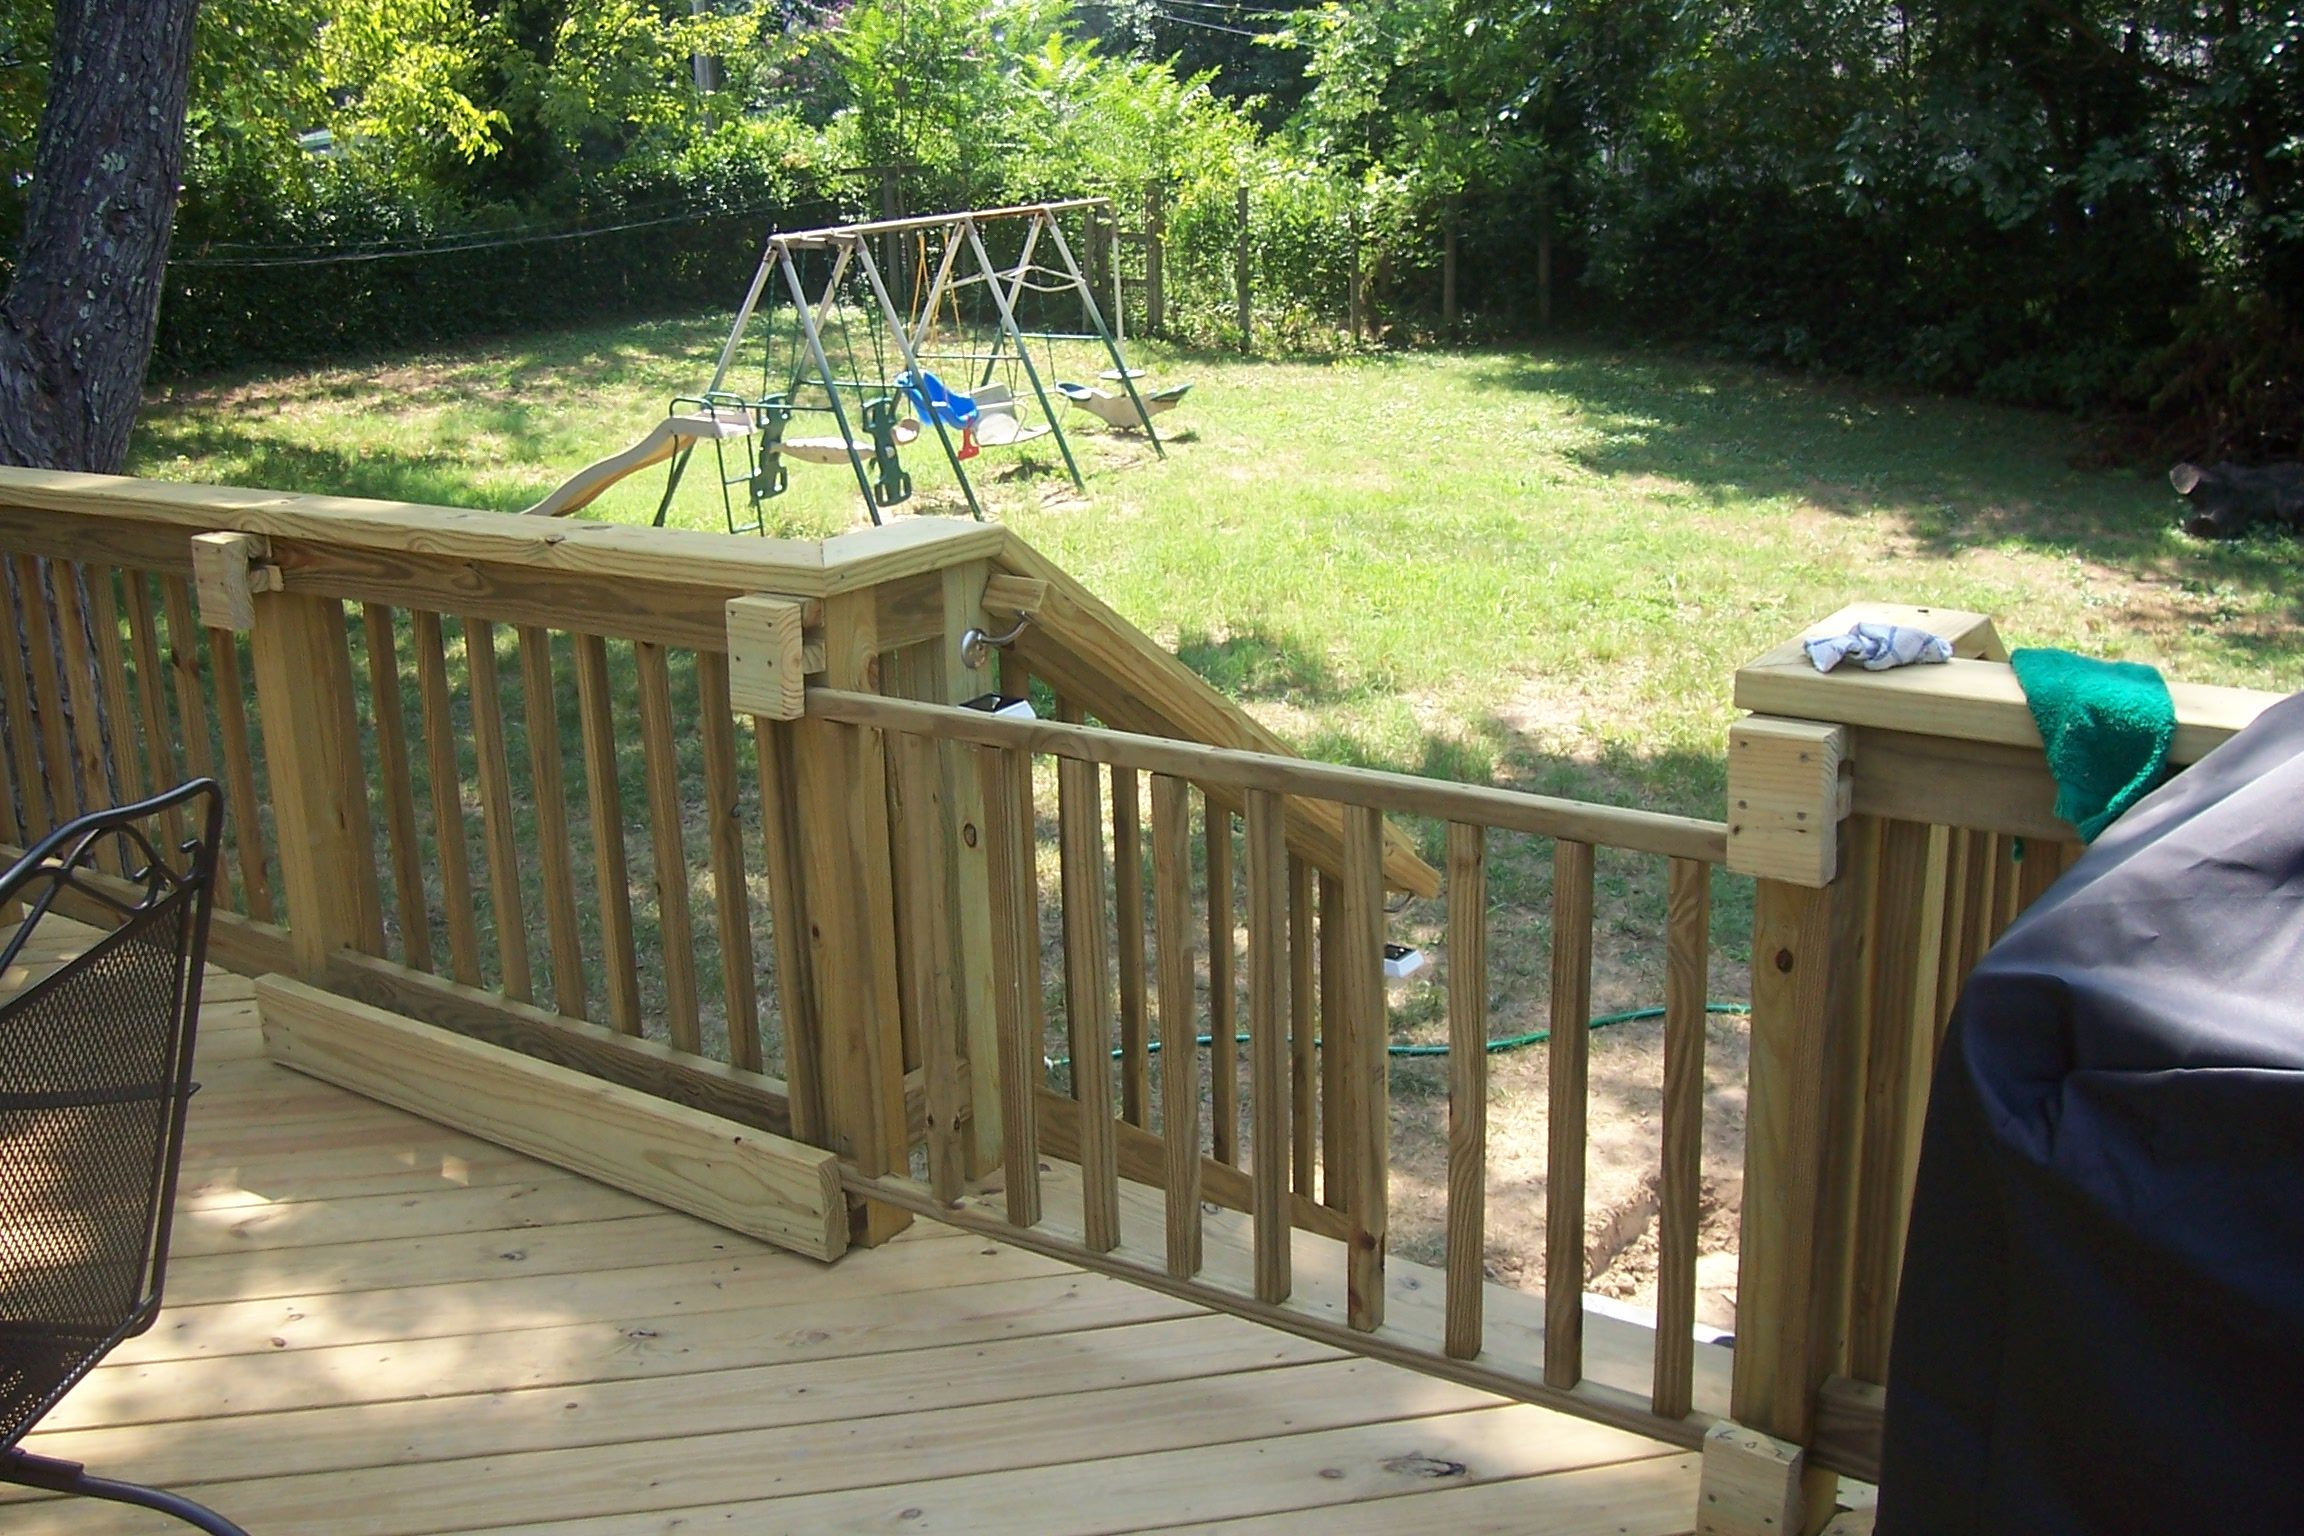 Use metal slider hardware wood at bottom keeps gate